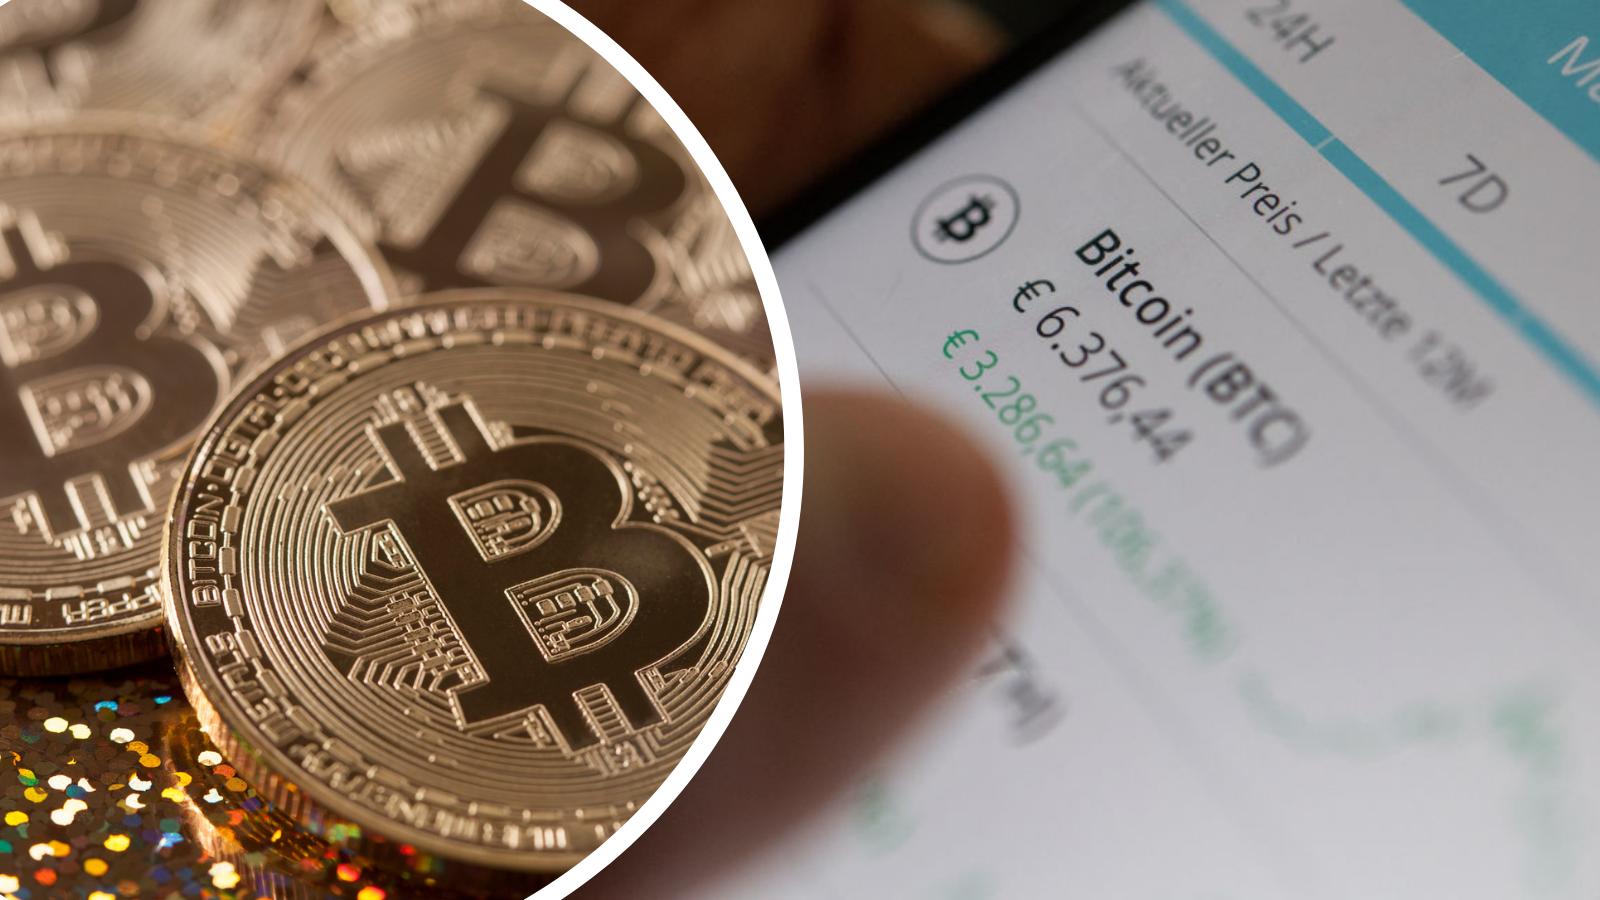 Kenneth slaughter bitcoins reinell hugnatan pba online betting